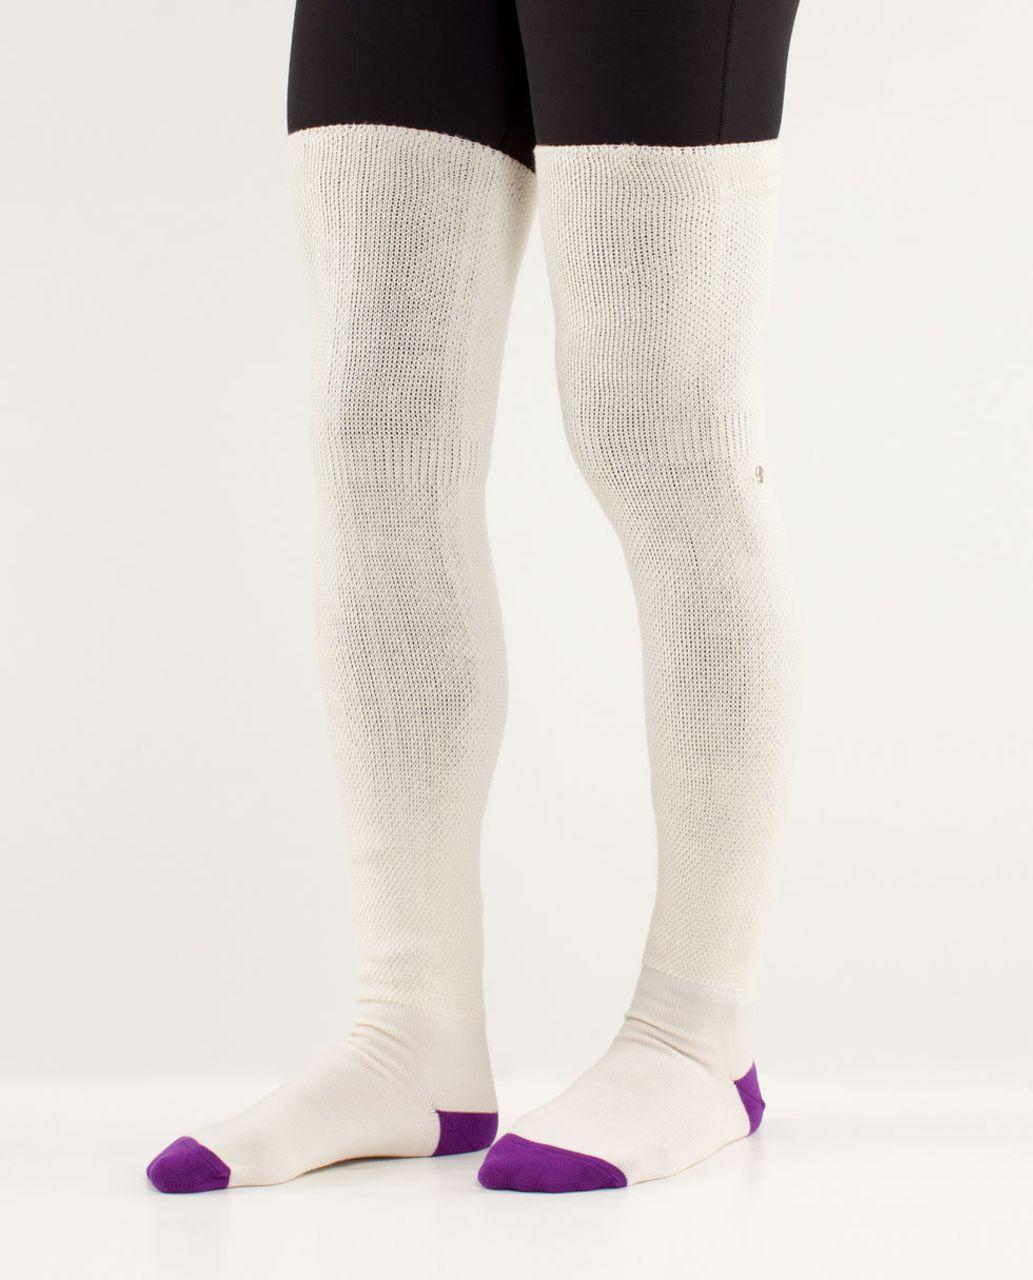 da17a4e7c64 Lululemon Savasana Sock - Polar Cream   Tender Violet - lulu fanatics